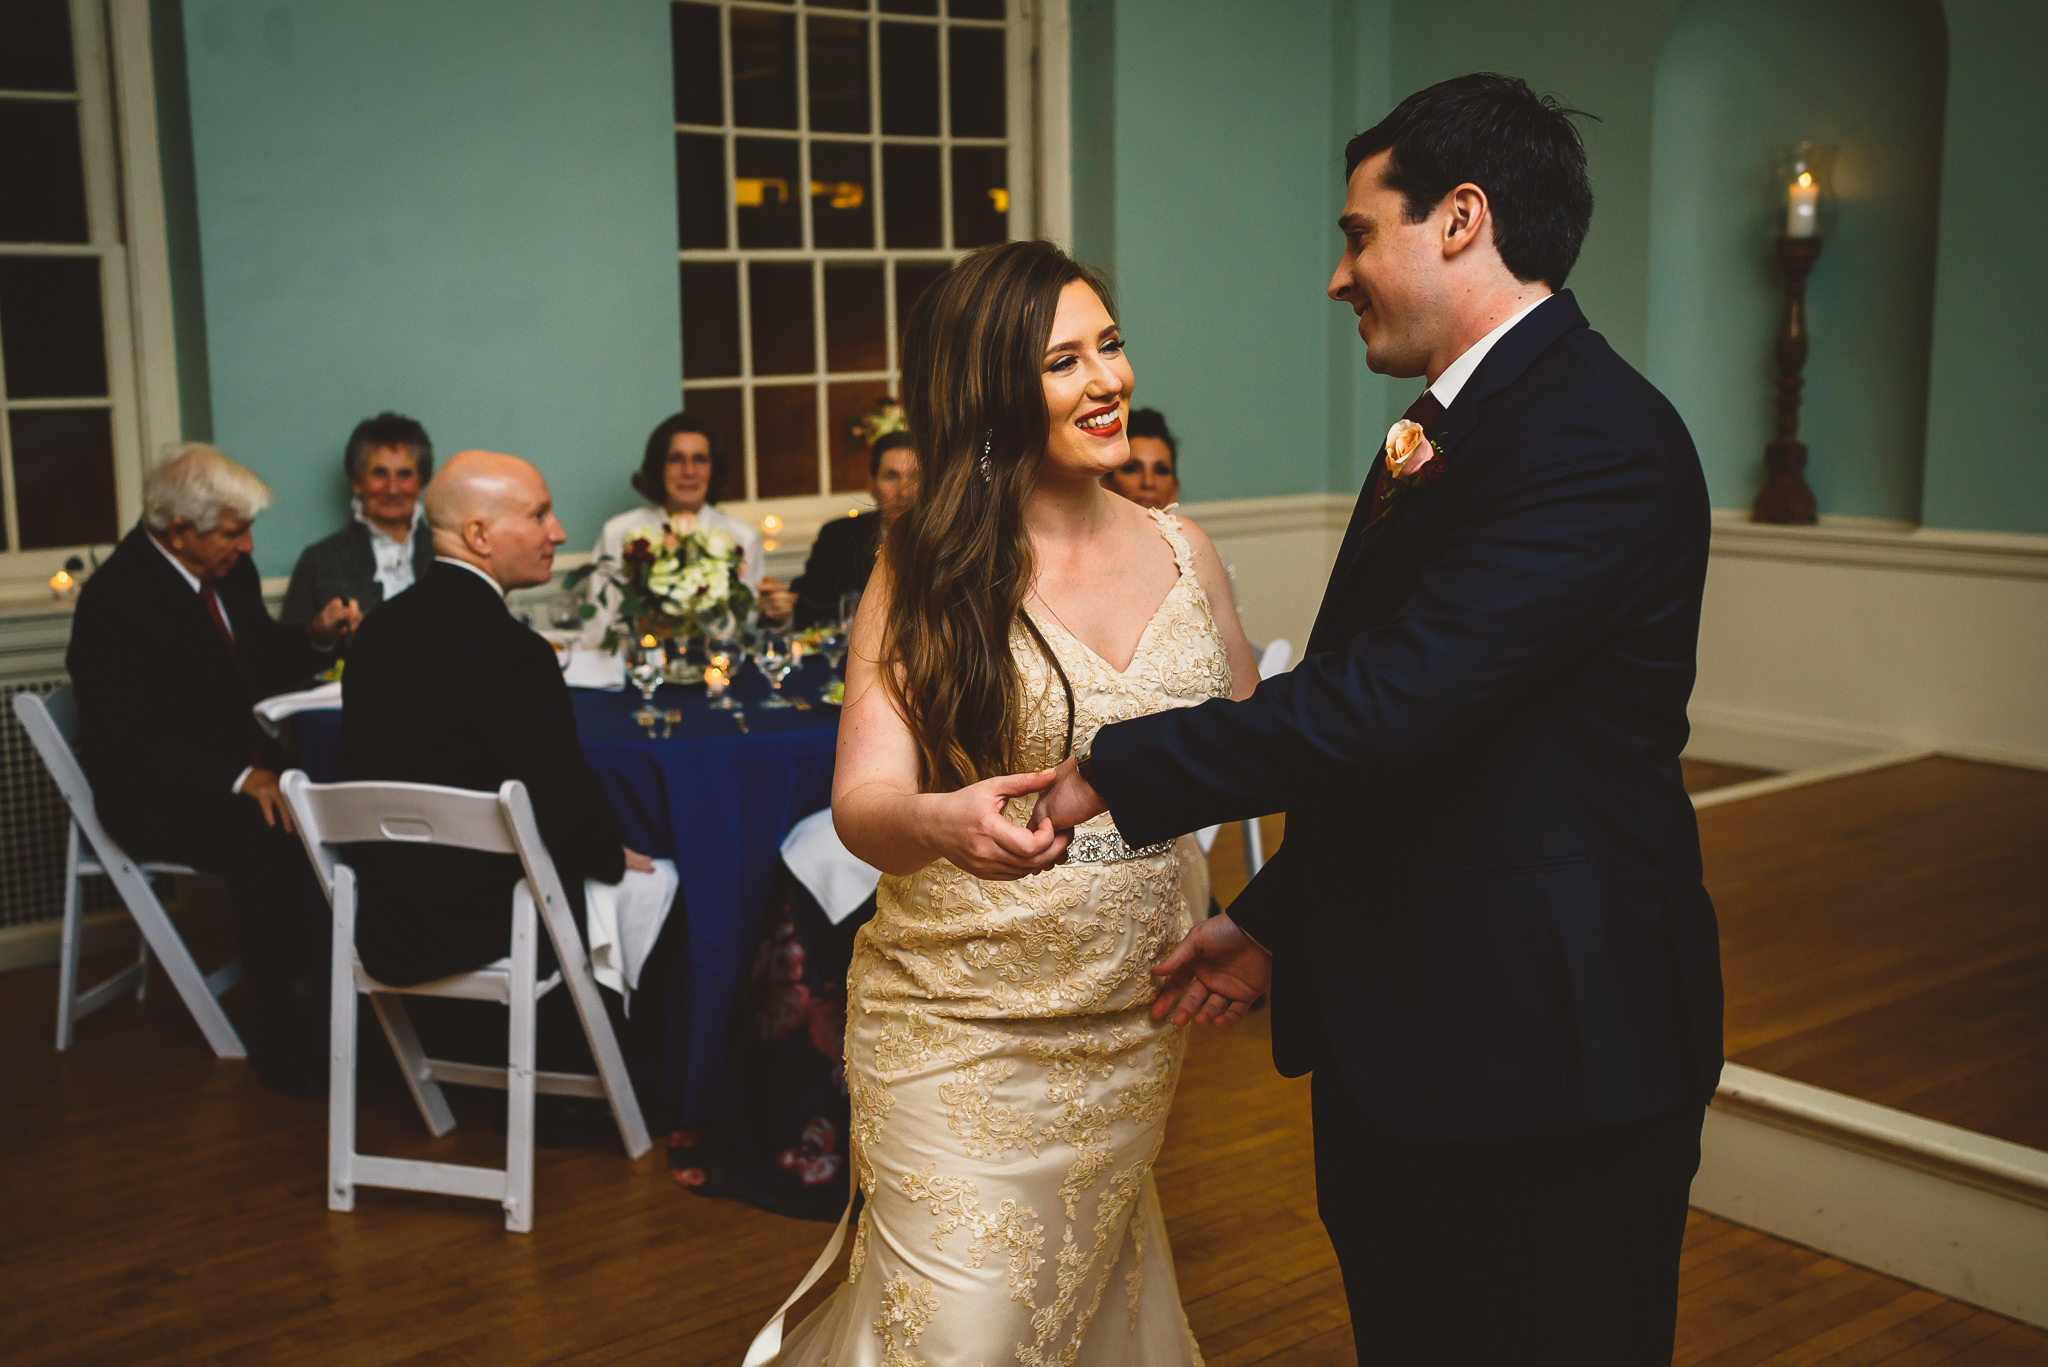 Colonial_Dames_Society_Wedding-0049.jpg